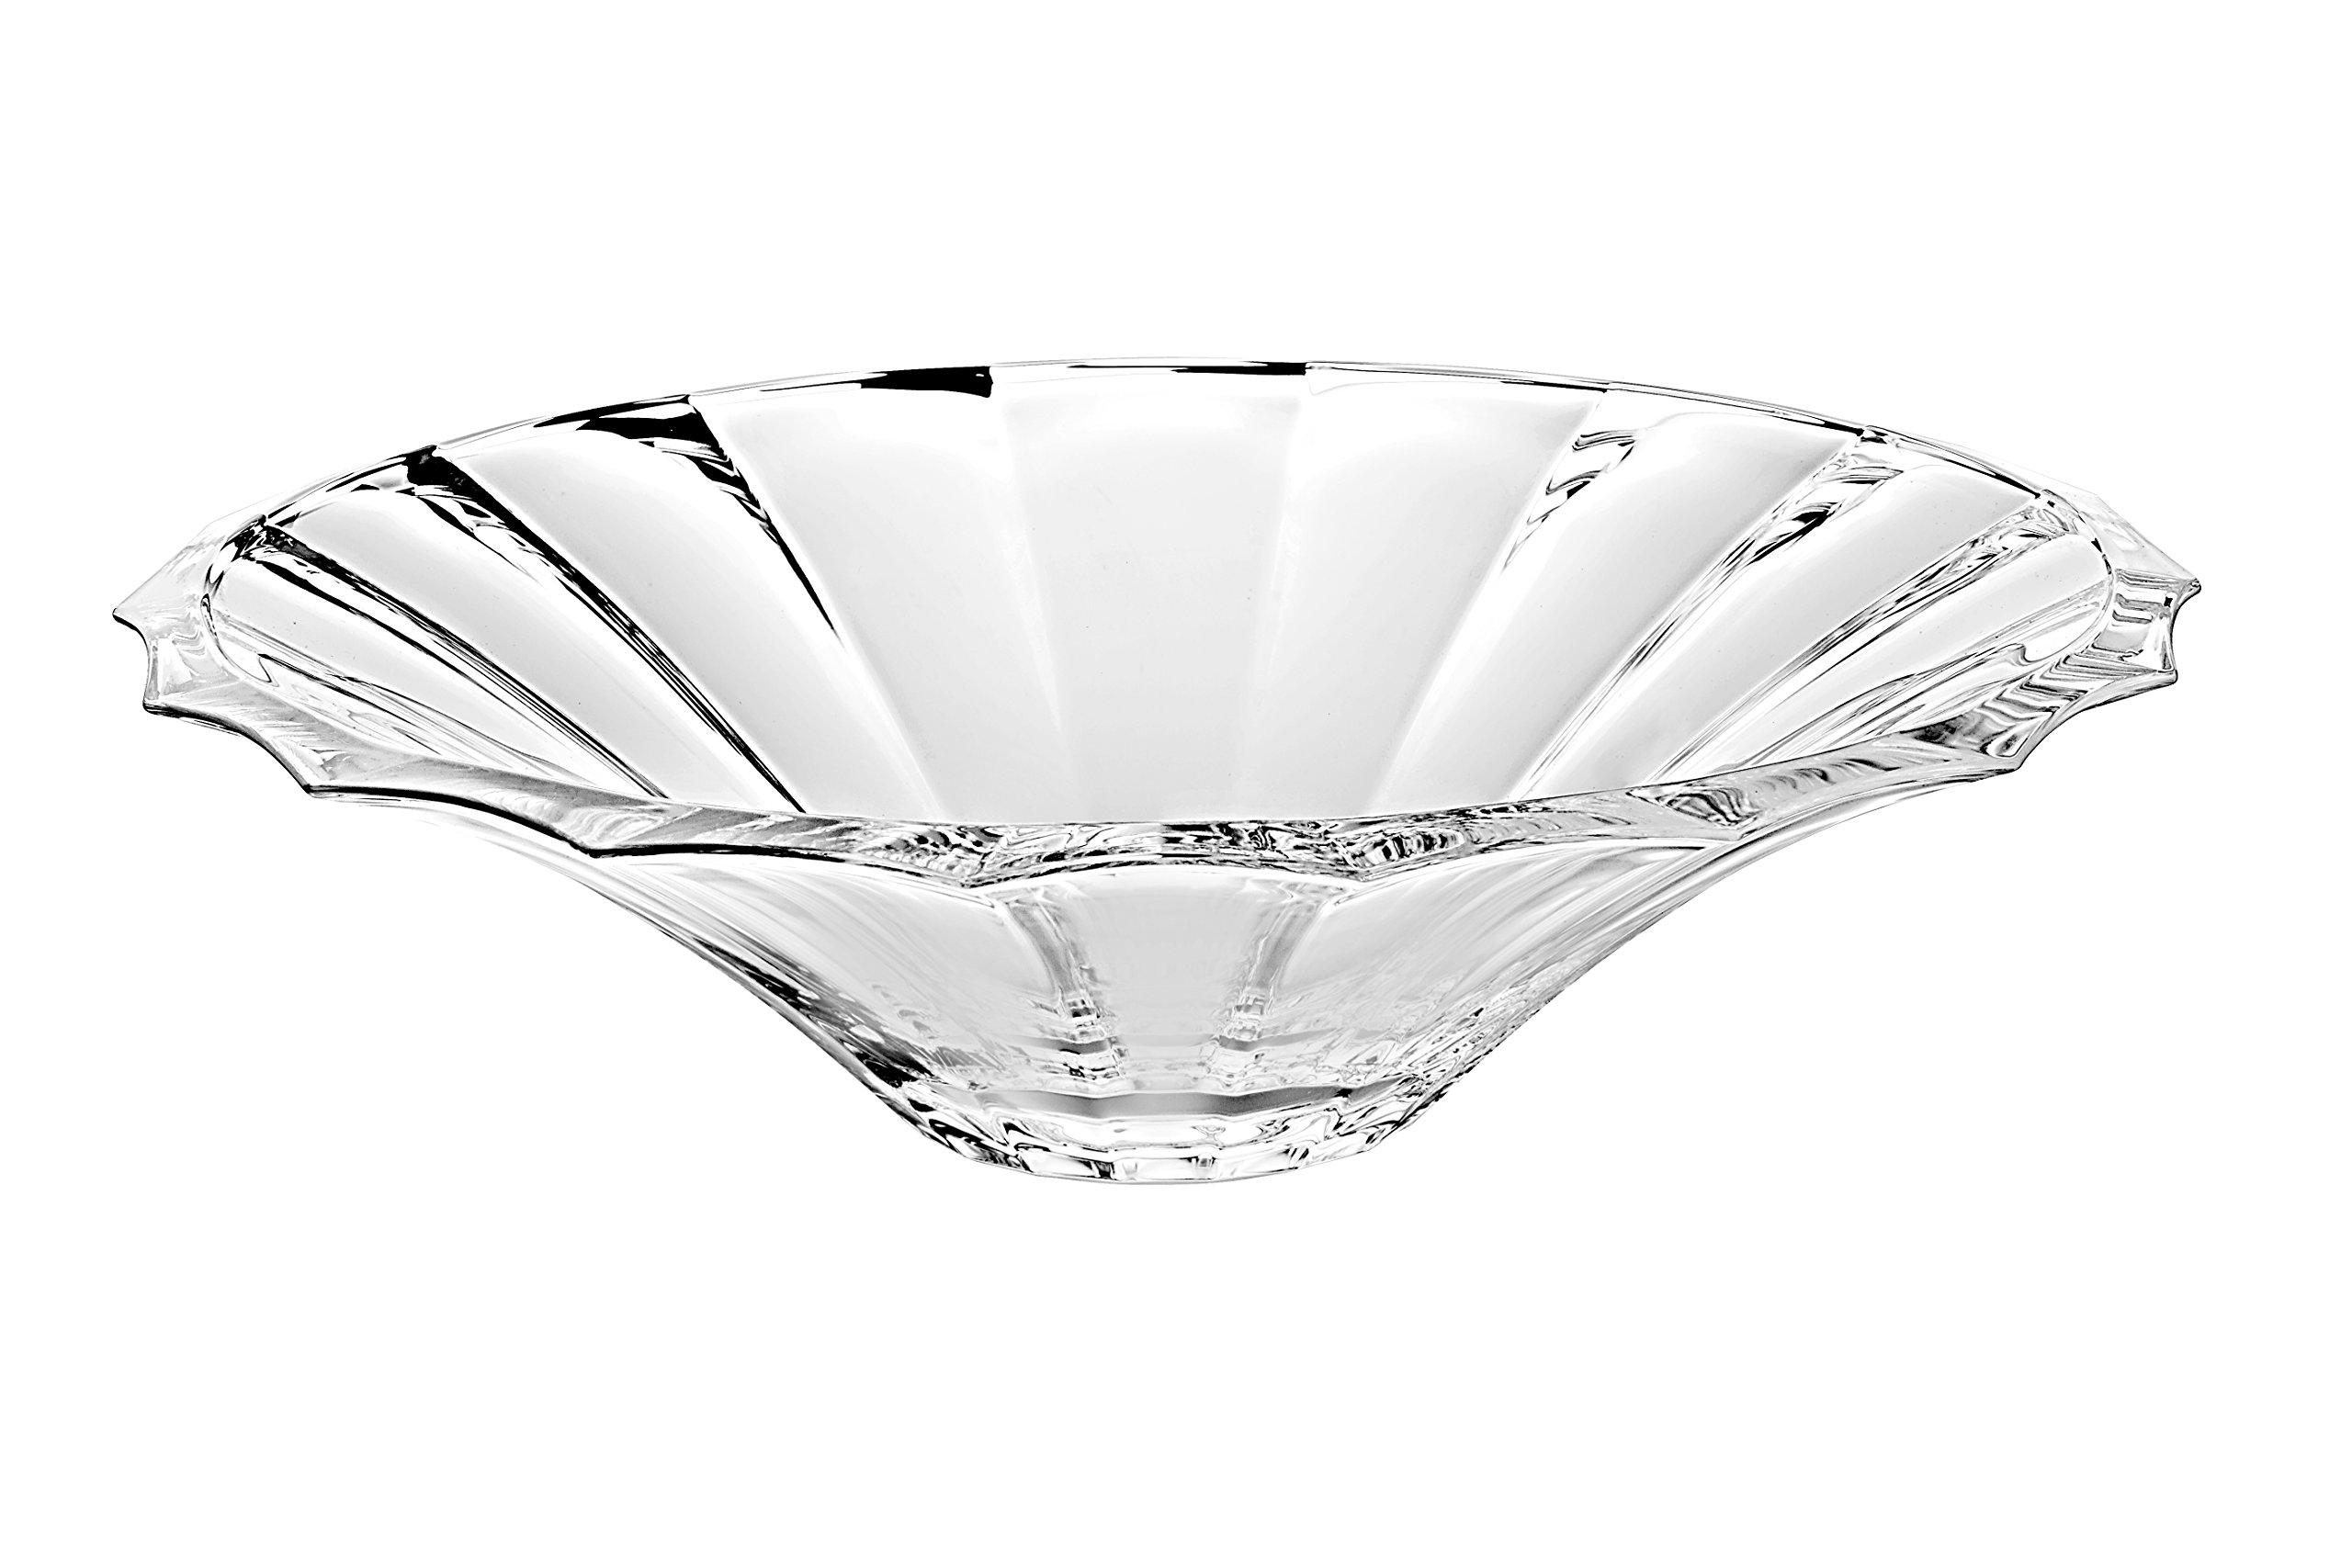 Barski - European Glass - Centerpiece Bowl - 13.2 '' Diameter - Made in Europe by Barski